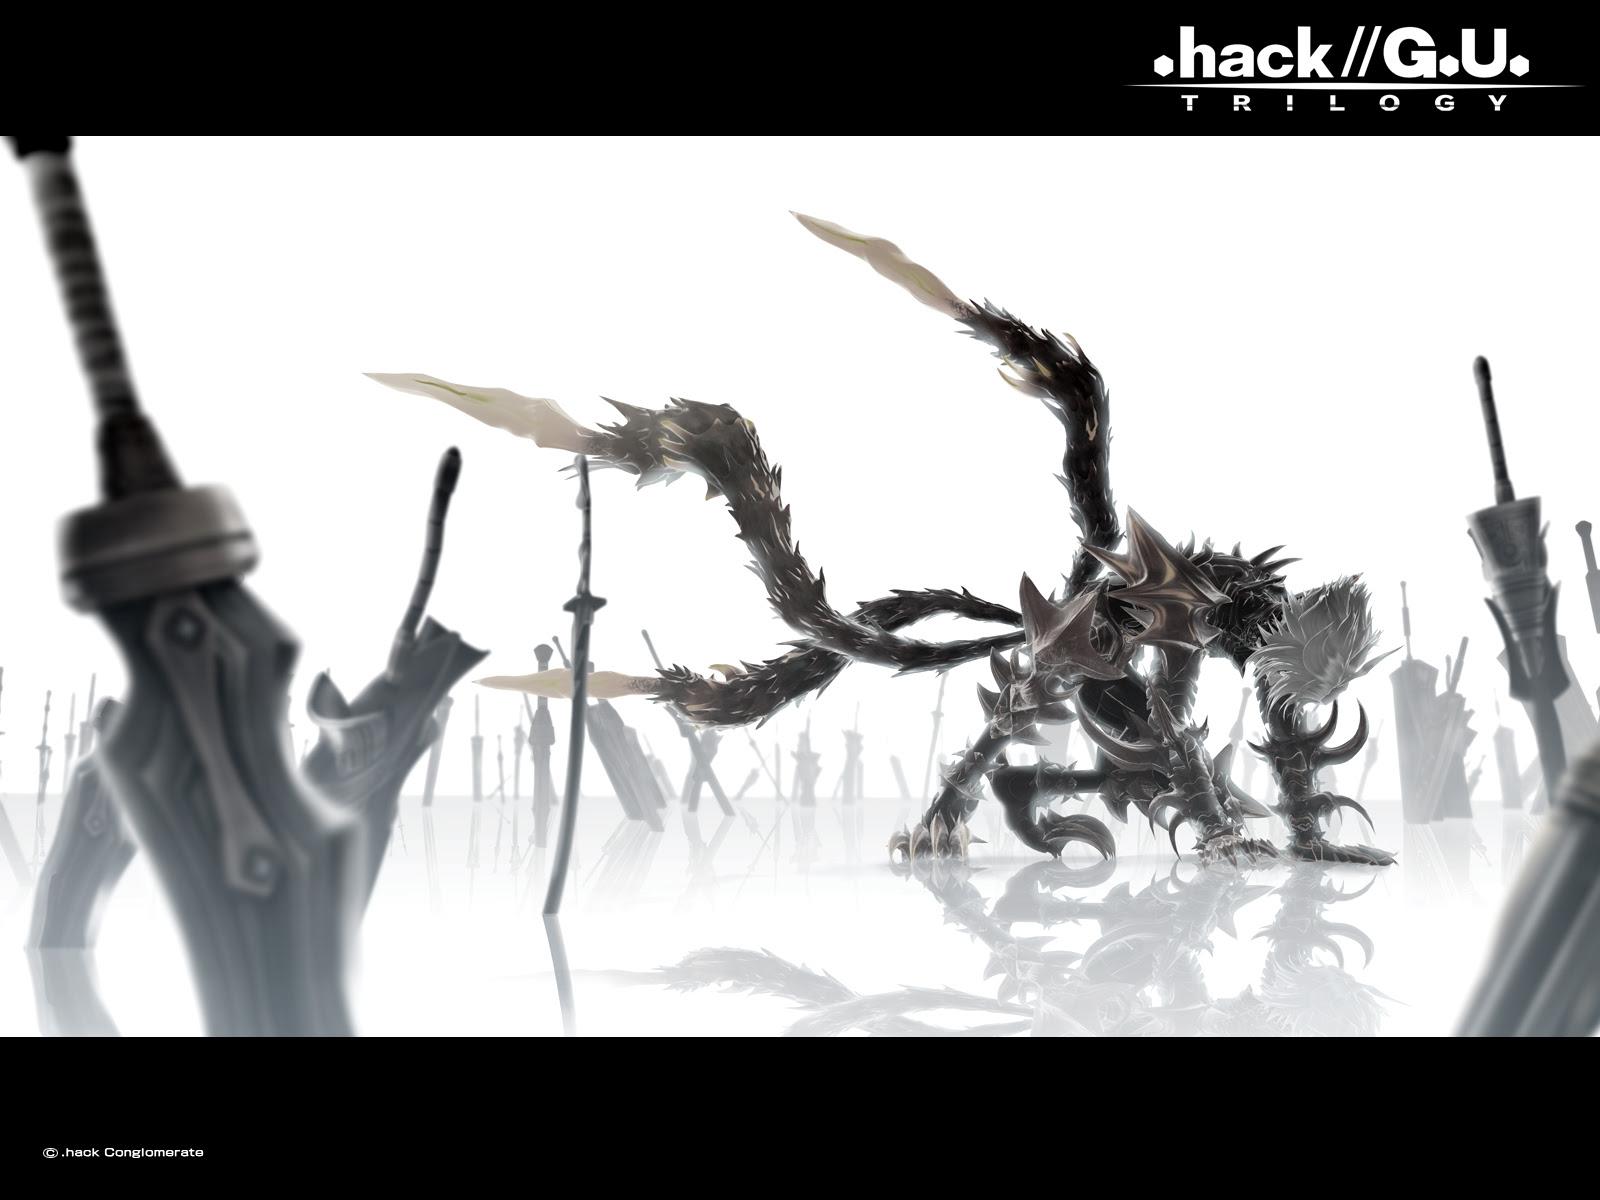 Hack G U Wallpaper And Scan Gallery Minitokyo